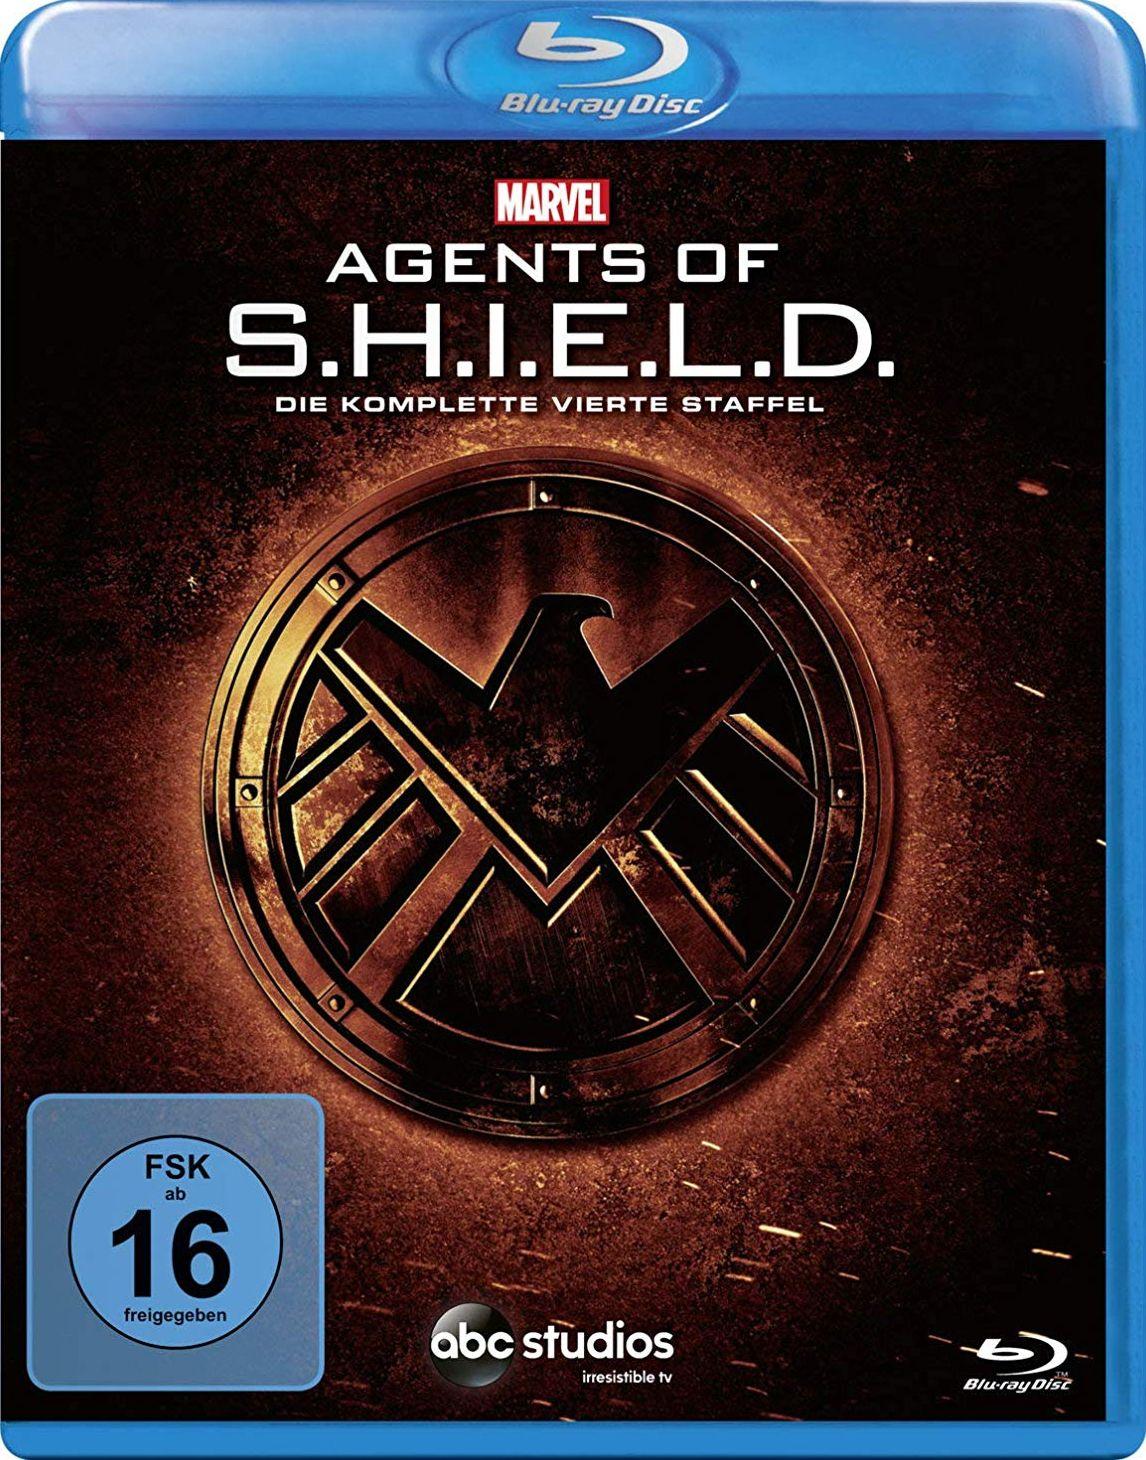 Marvel's Agents of S.H.I.E.L.D. - Die komplette vierte Staffel (5 Discs) (BLURAY)